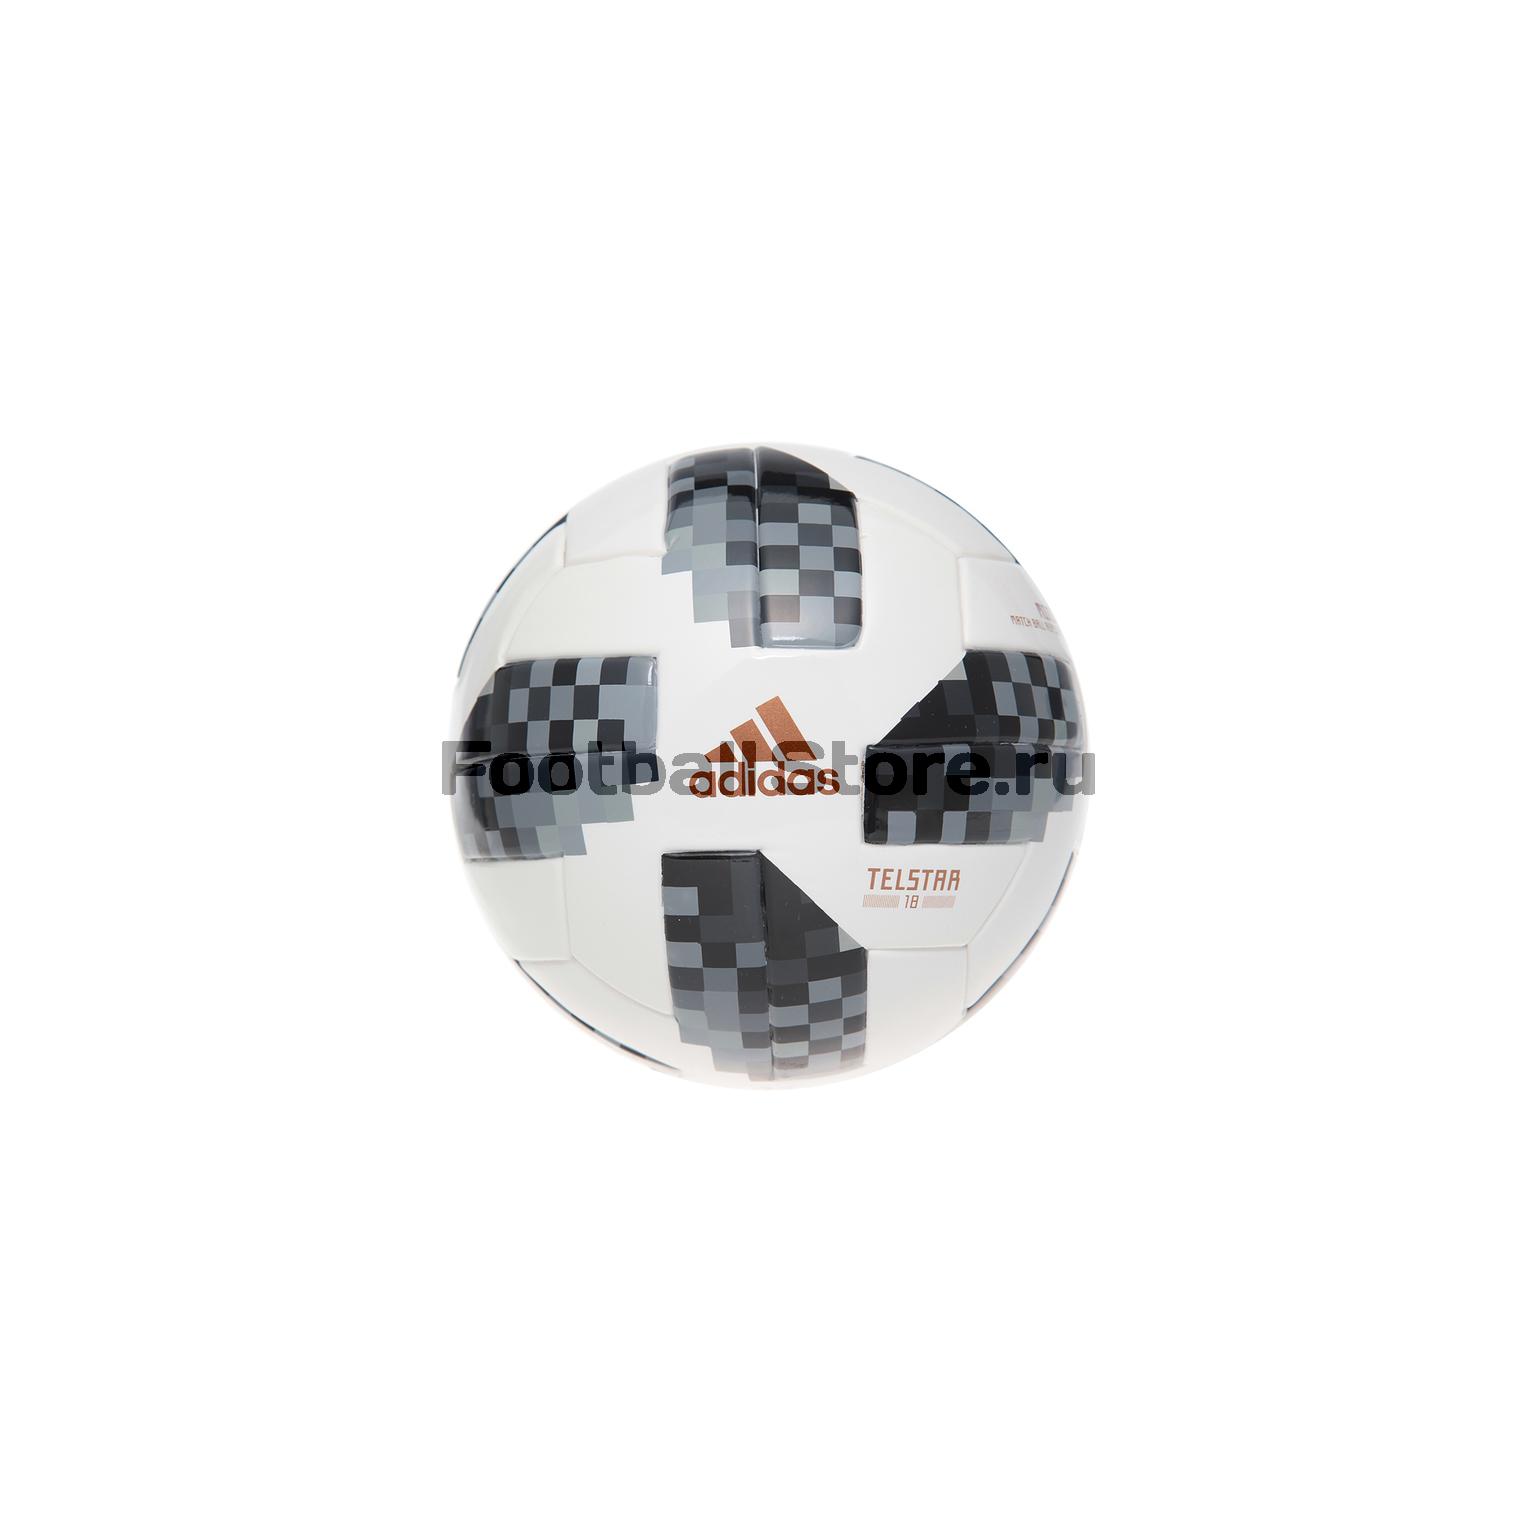 Сувенирные Adidas Мяч сувенирный Adidas Mini ЧМ-2018 CE8139